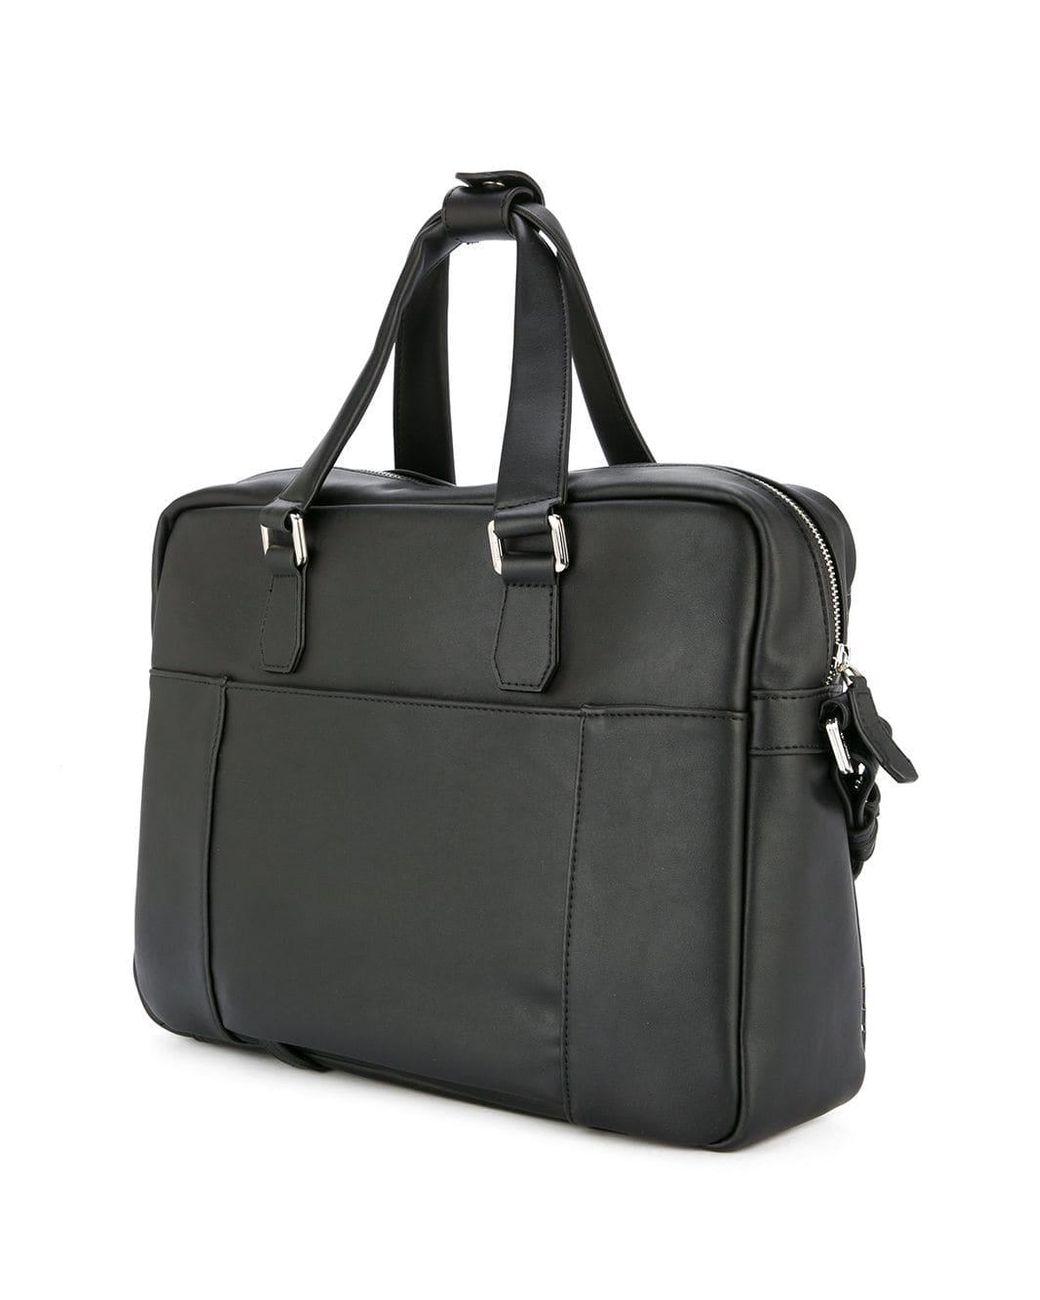 7c2f4ec207f Cerruti 1881 Punch Hole Detailed Briefcase in Black for Men - Lyst